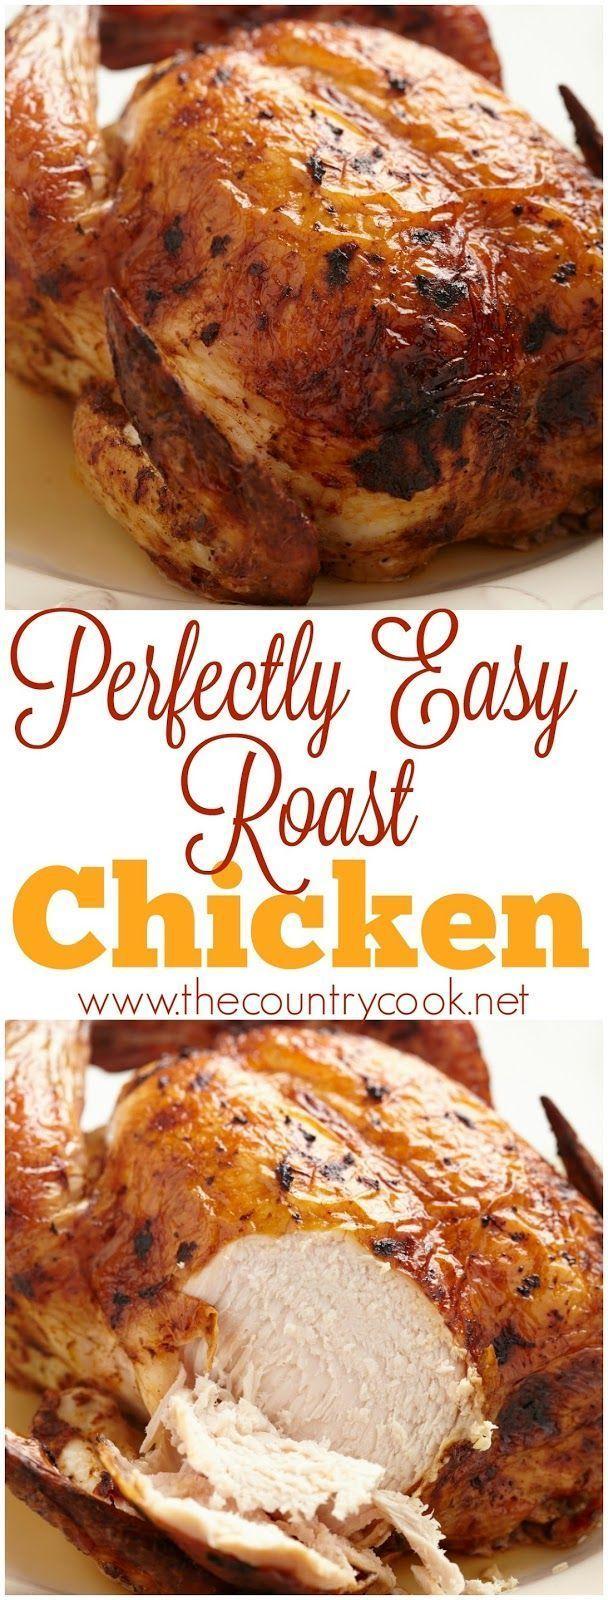 Perfect Roast Chicken Recipe Perfect Roast Chicken Roast Chicken Recipes Chicken Recipes